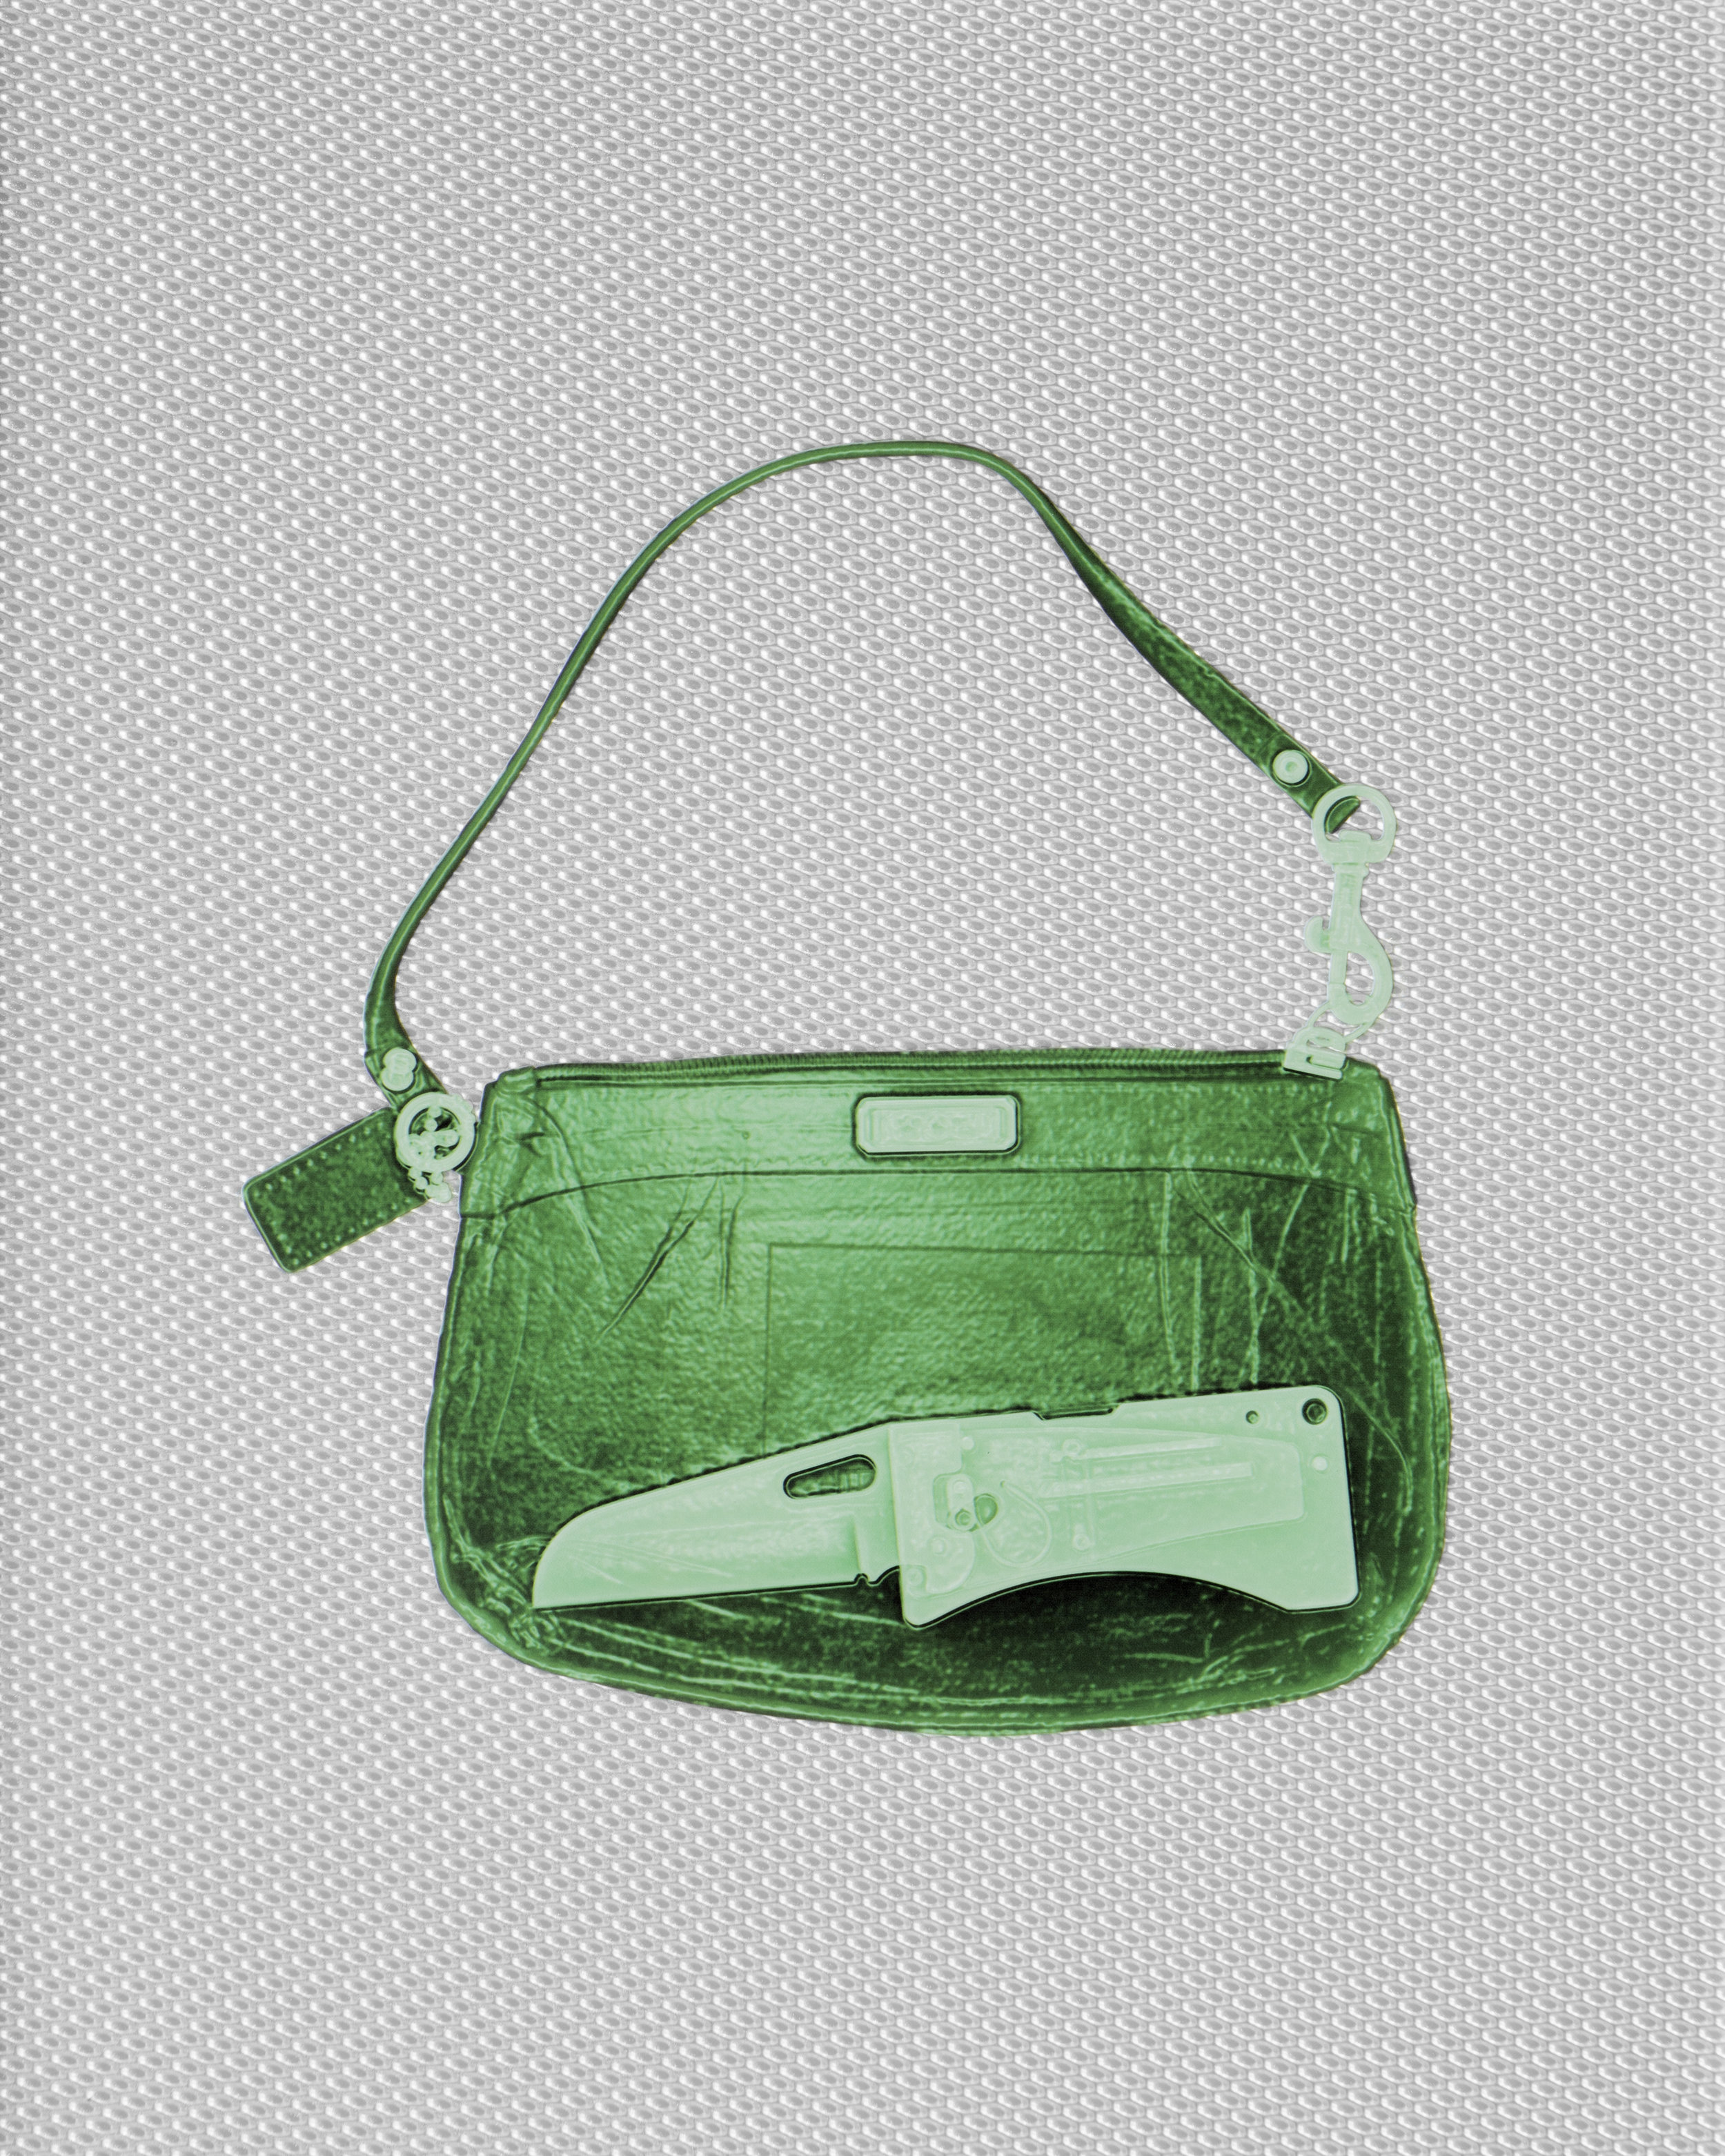 Green Coach Handbag with Knife